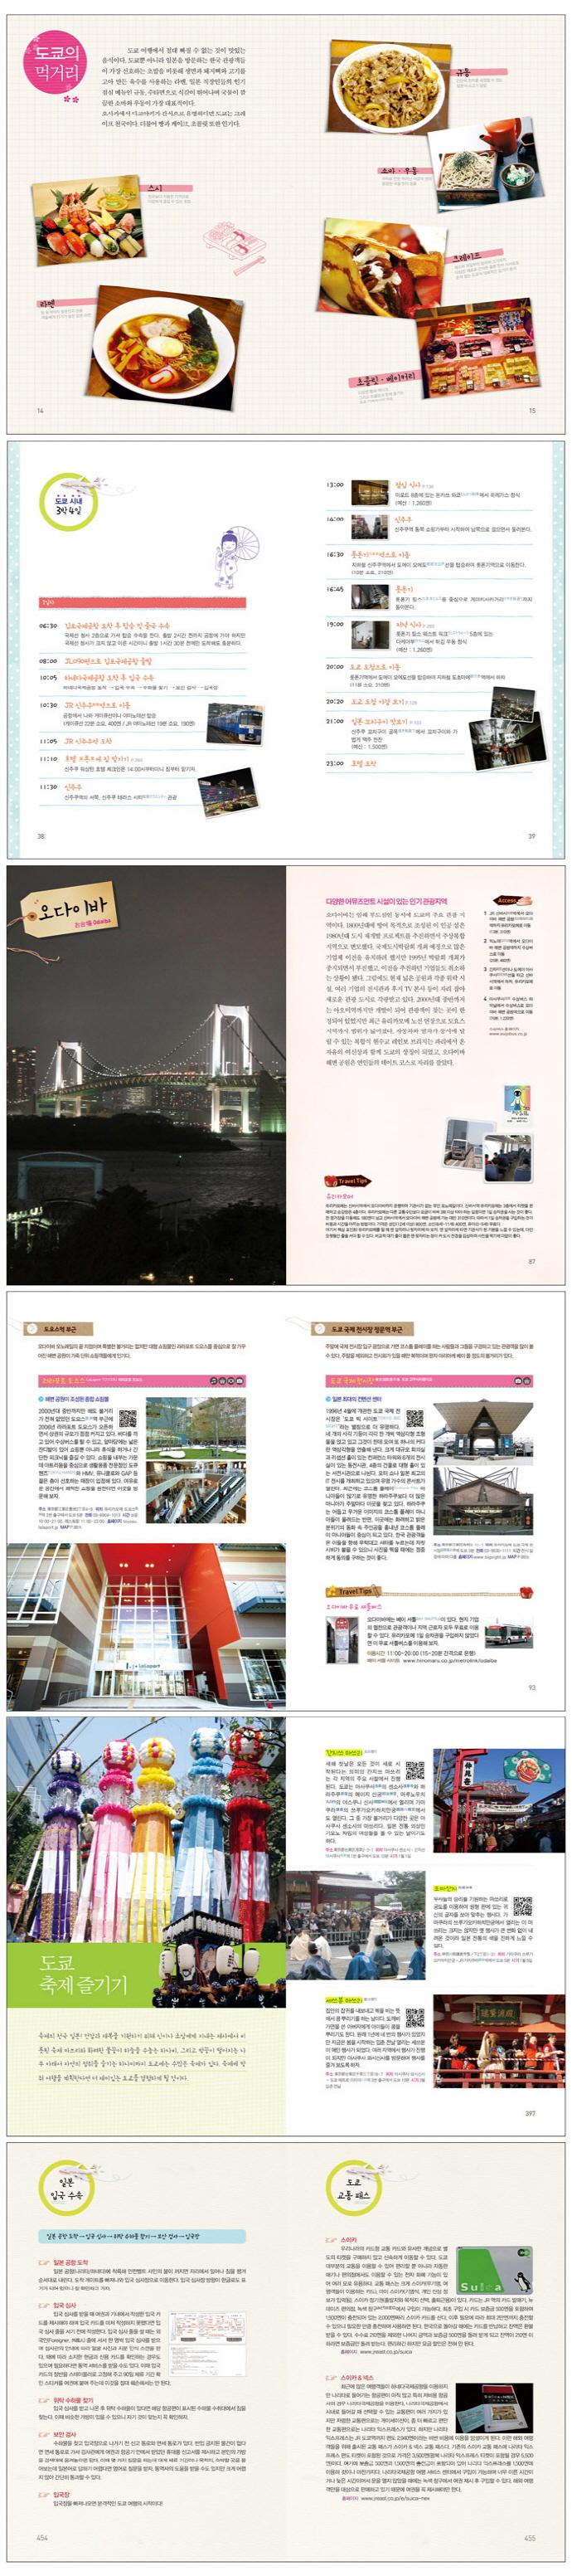 ENJOY 미니북 도쿄(2판)(Enjoy 세계여행시리즈 1)(포켓북(문고판)) 도서 상세이미지